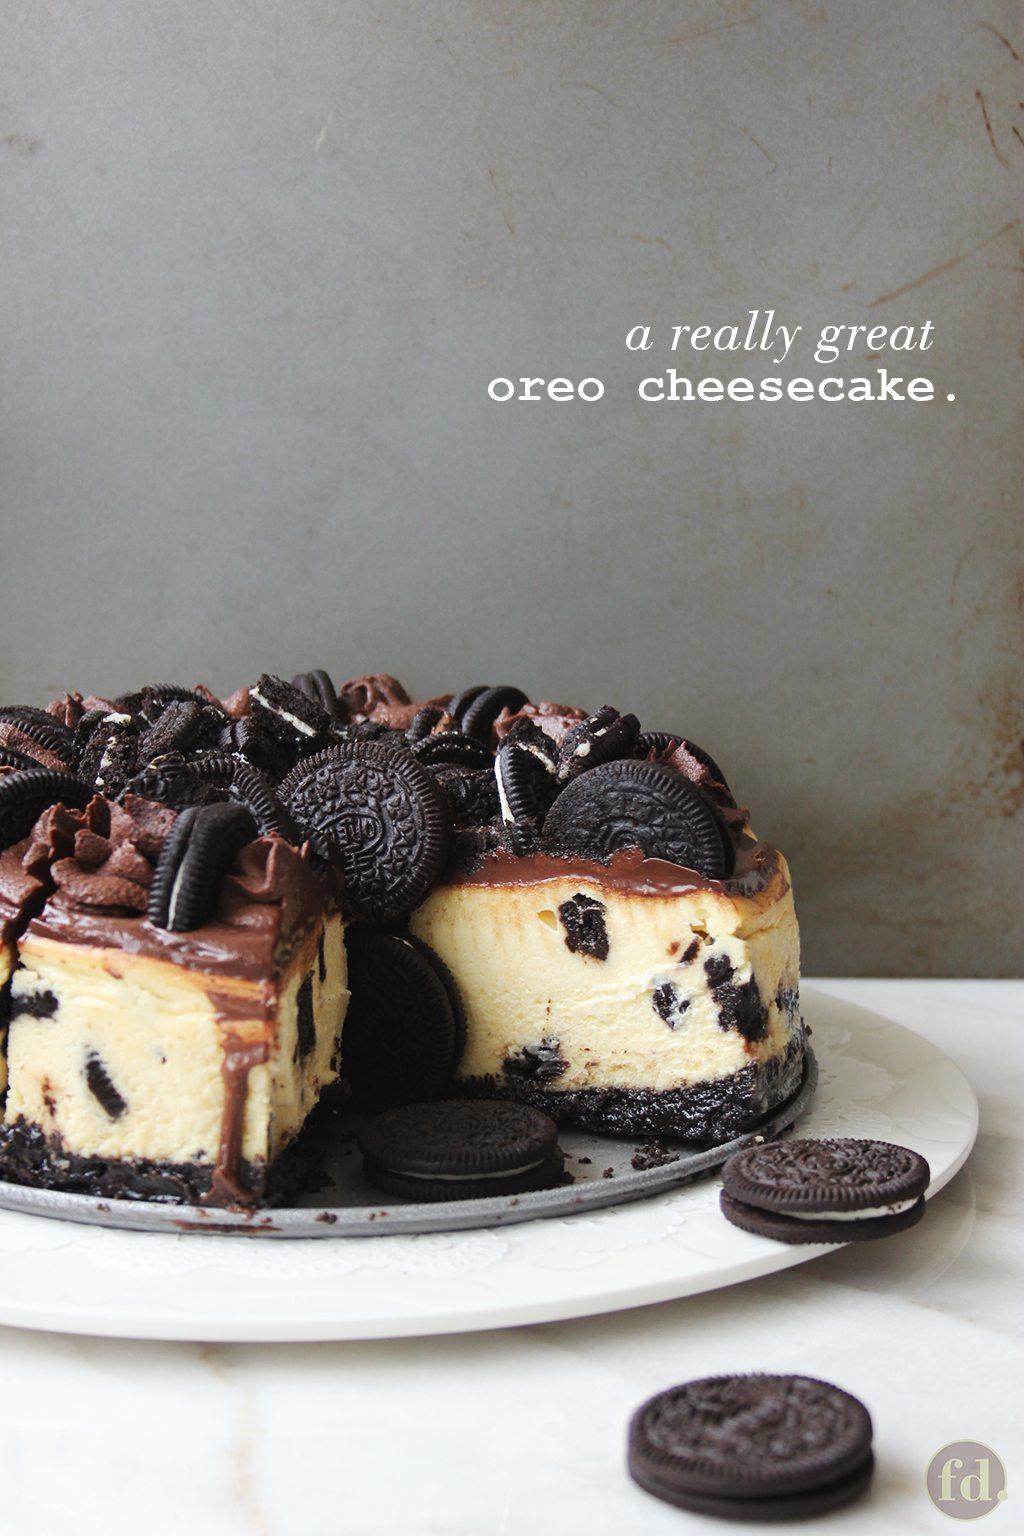 oreo_cheesecake_title_1c